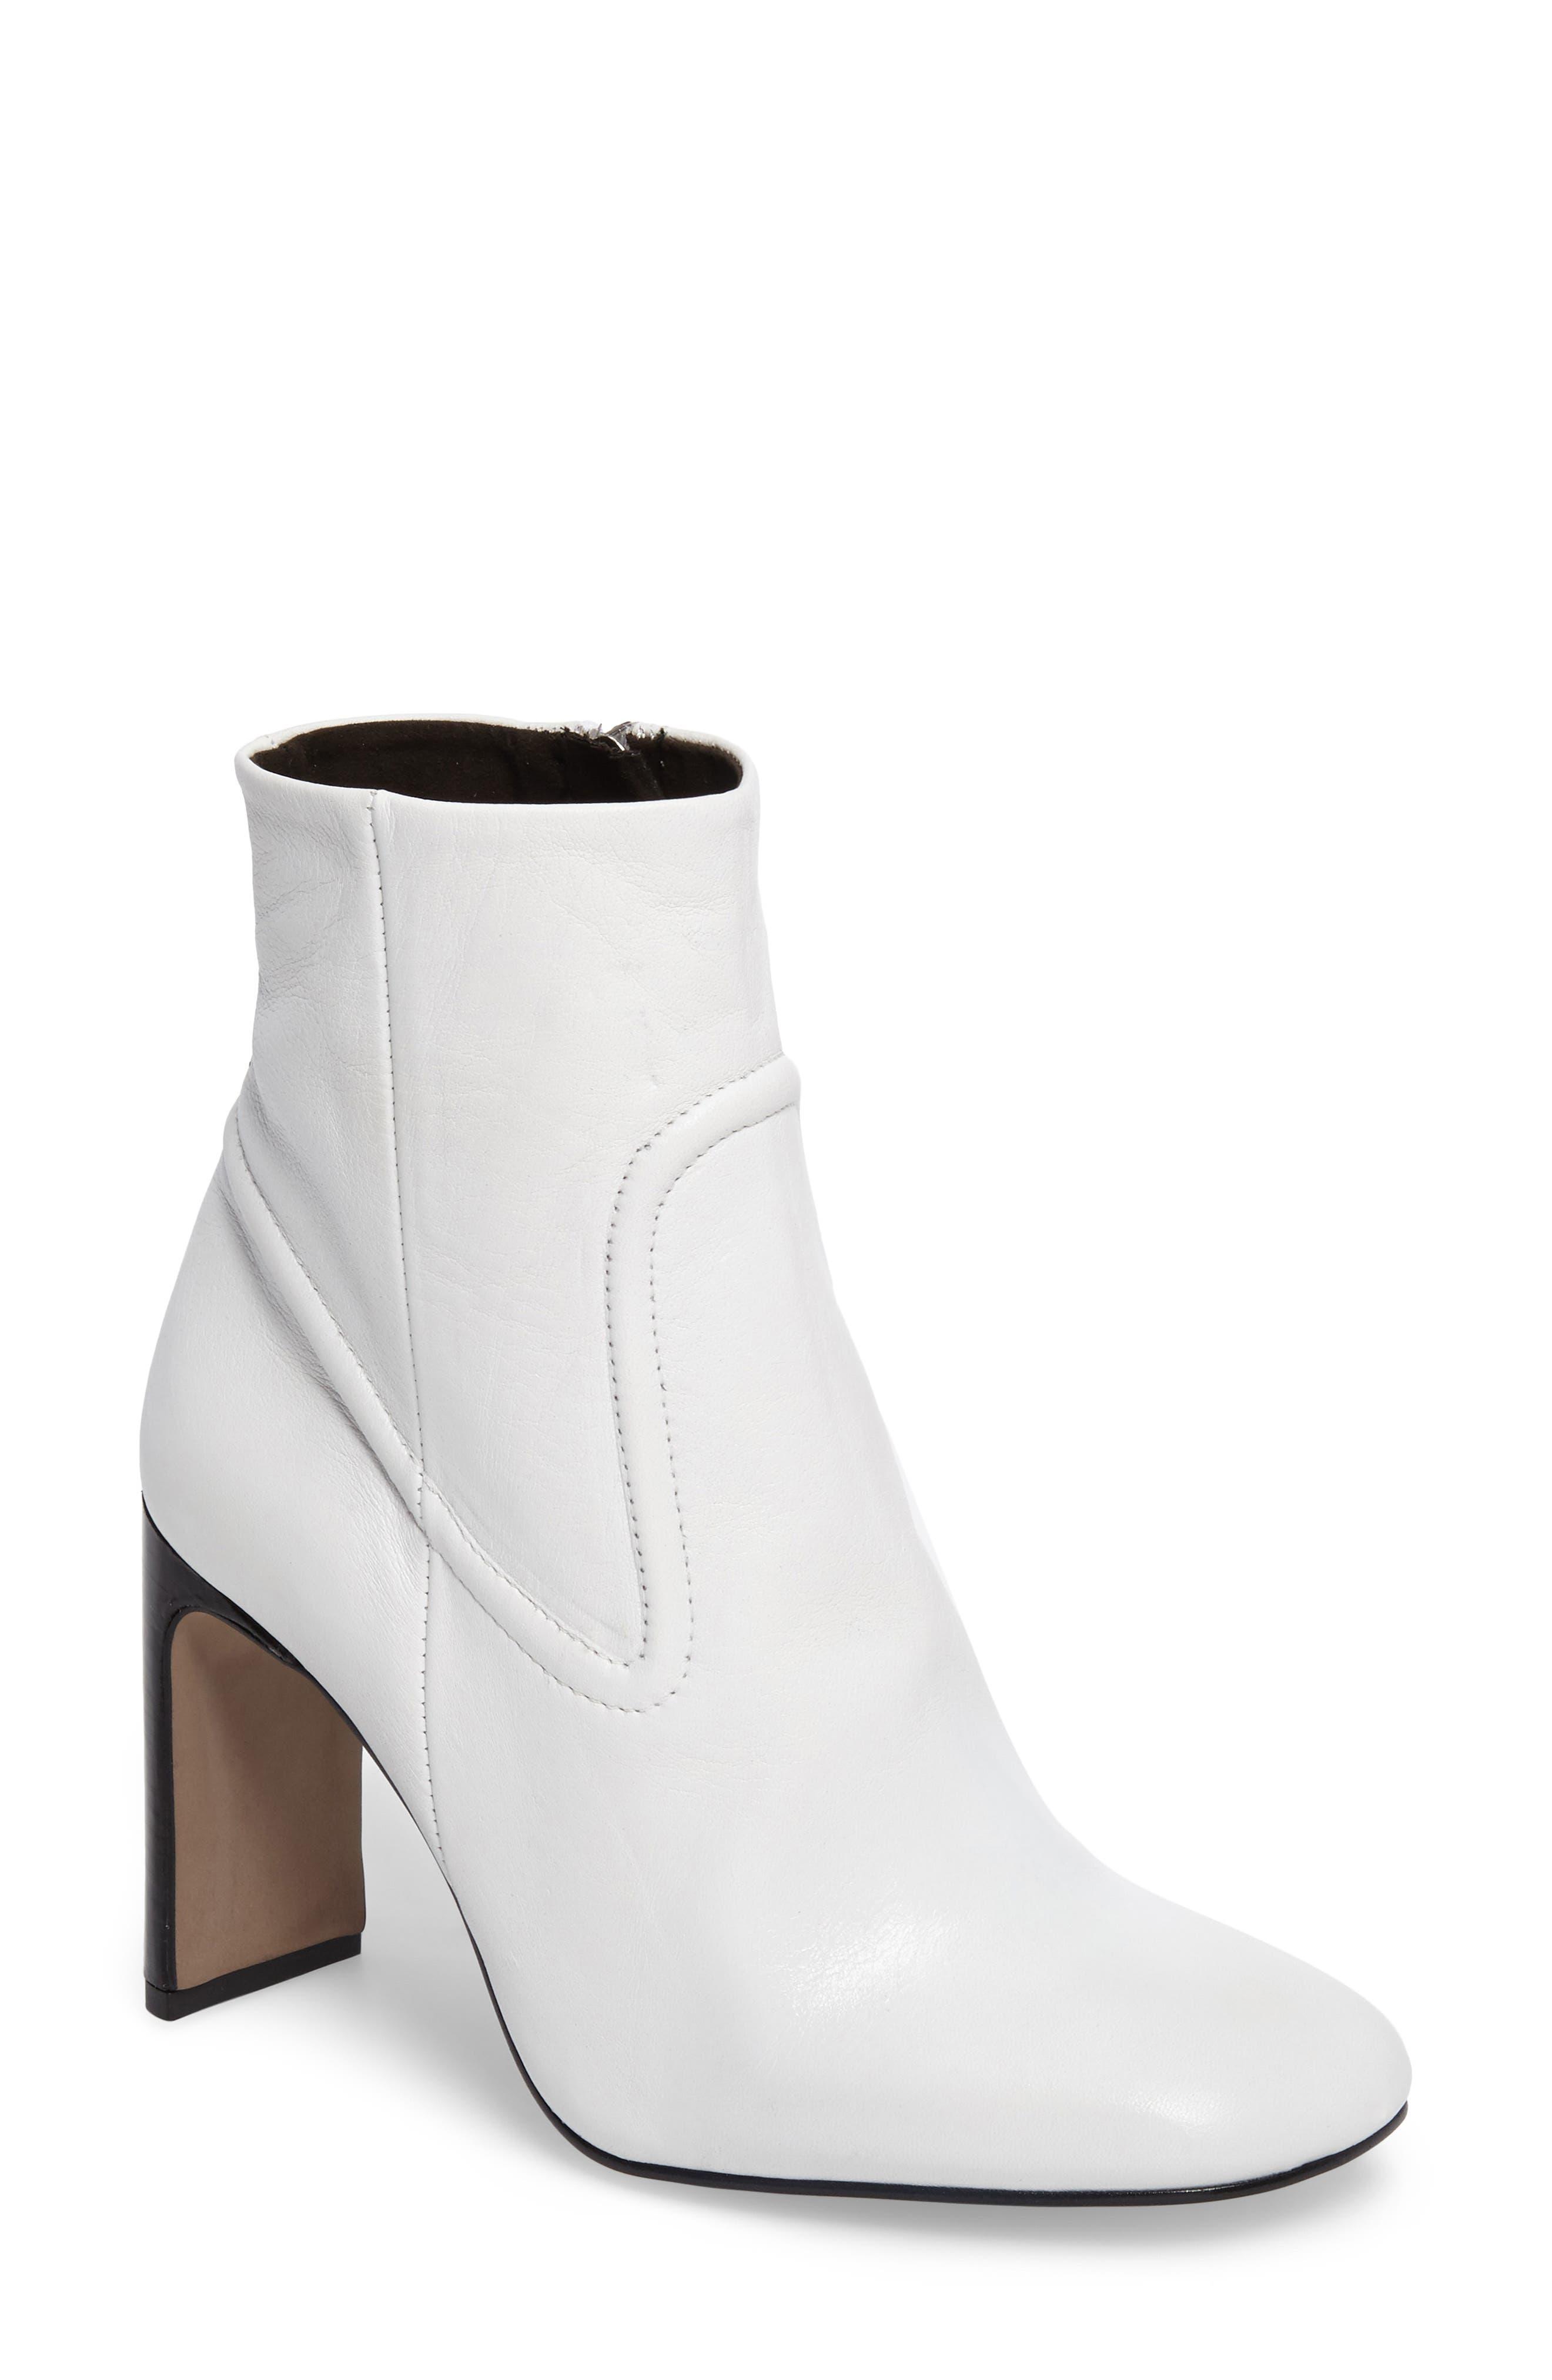 Honeydew Flat Heel Bootie,                             Main thumbnail 1, color,                             White